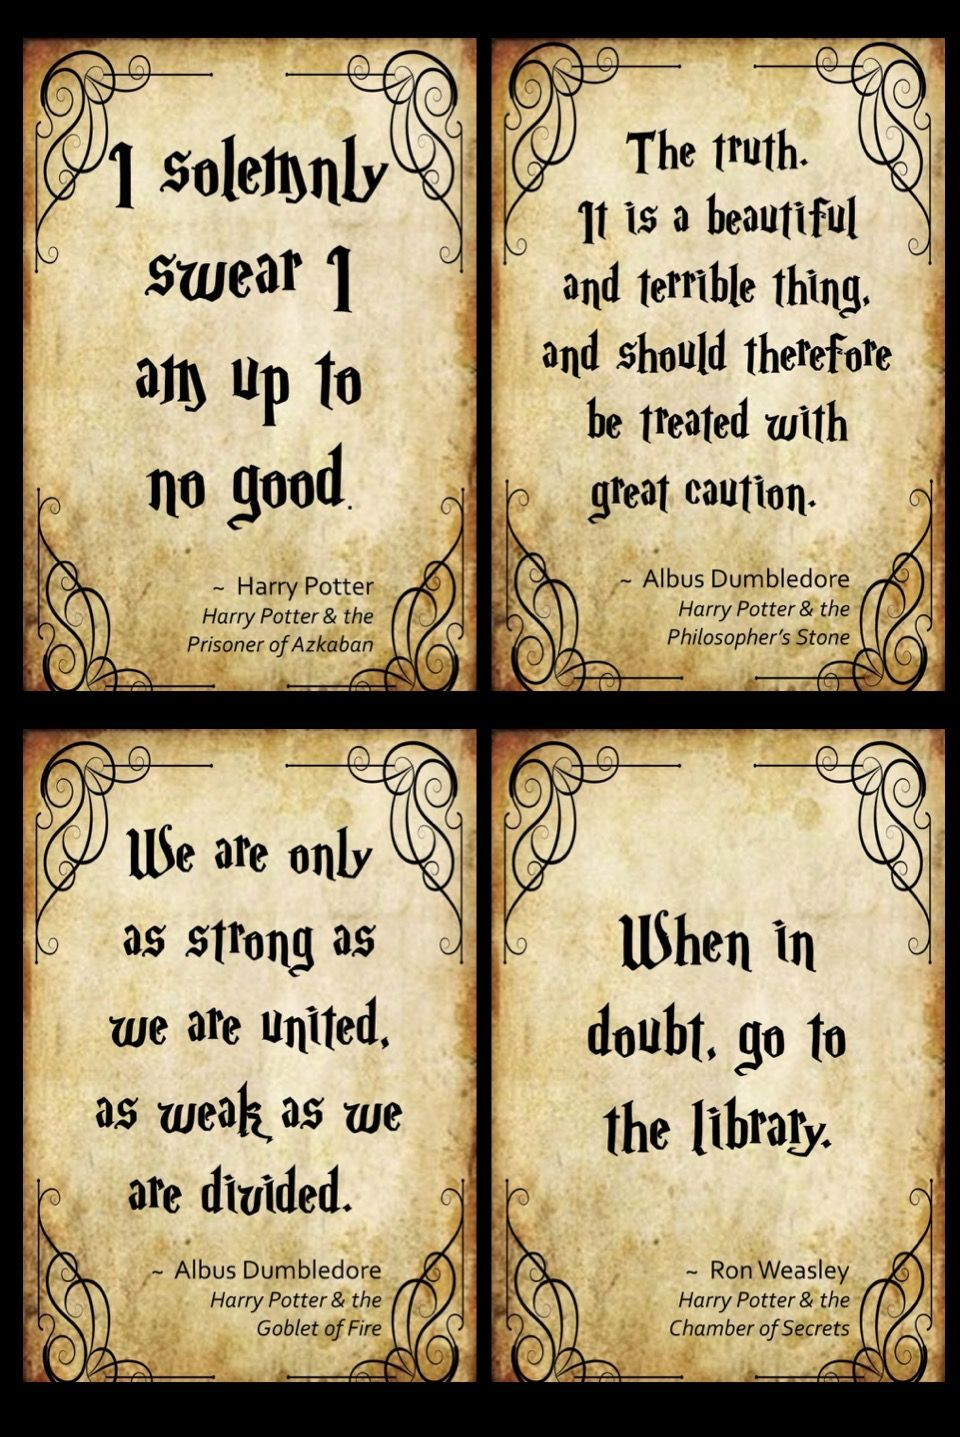 Harry Potter Quotes Harry Potter Quotes Harry Potter Book Quotes Harry Potter Quotes Inspirational